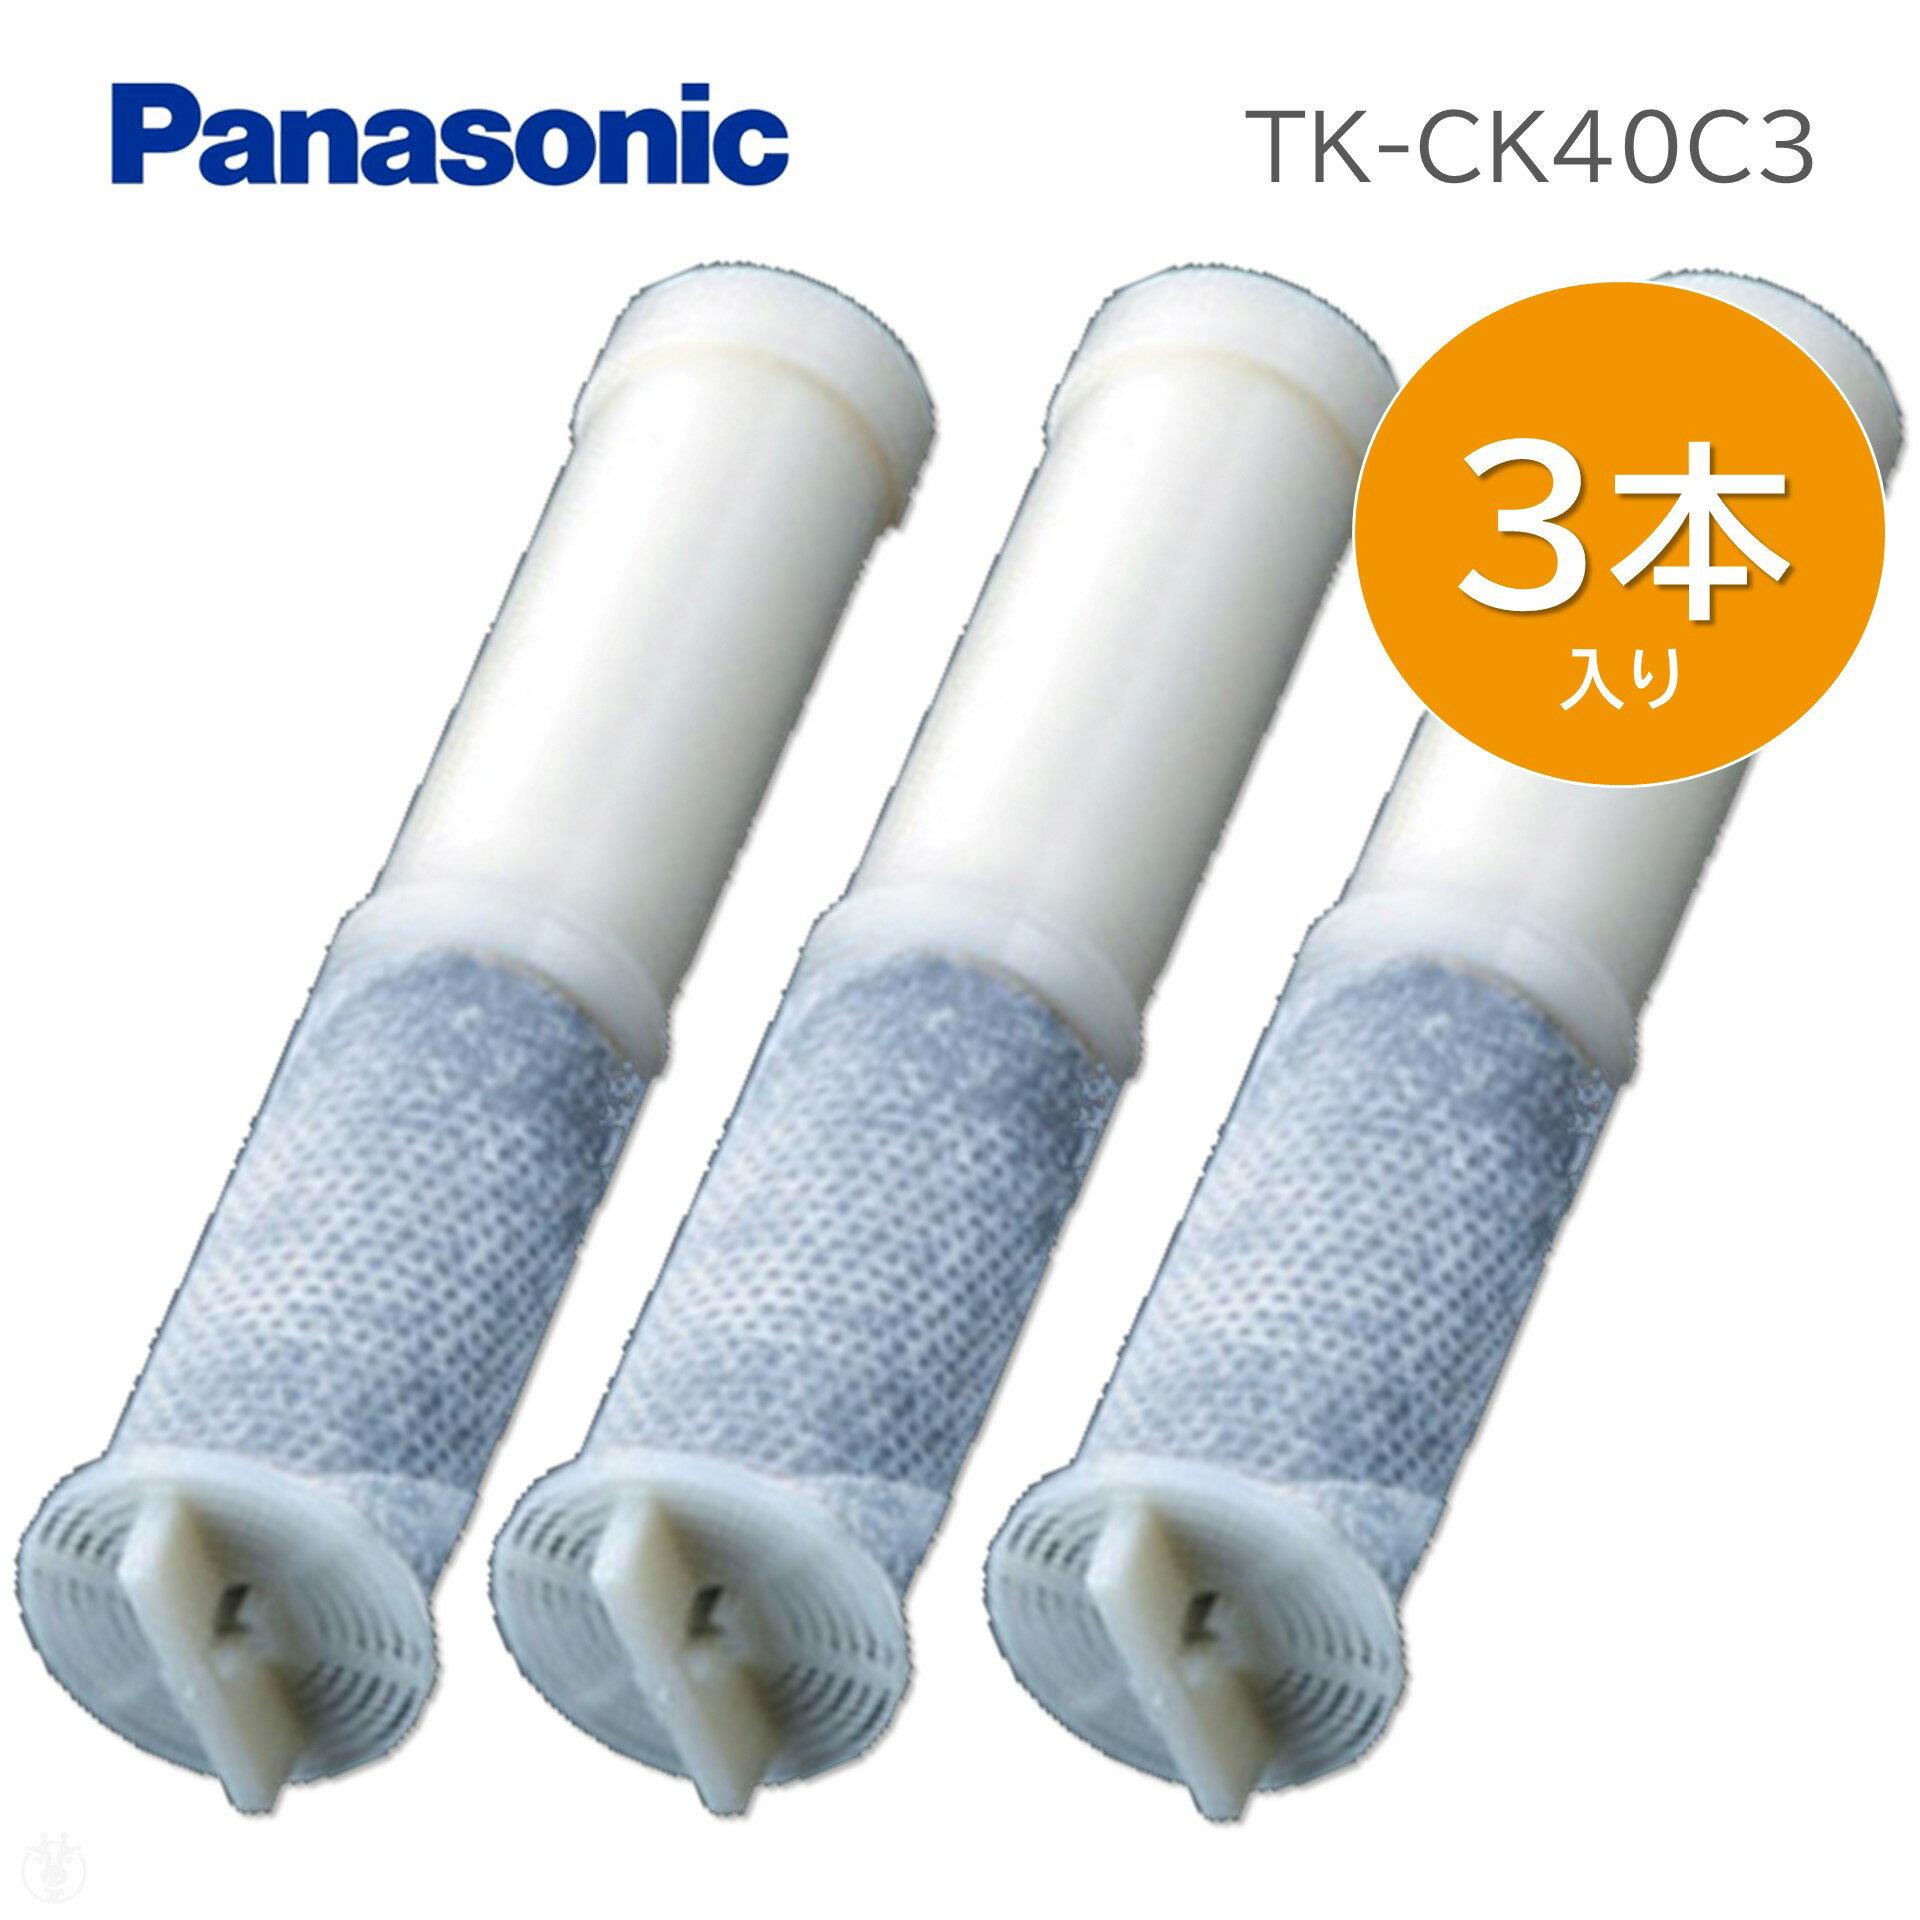 TK-CK40C3 パナソニック Panasonic TKCK40C3 水栓型浄水器 カートリッジ(3本入)